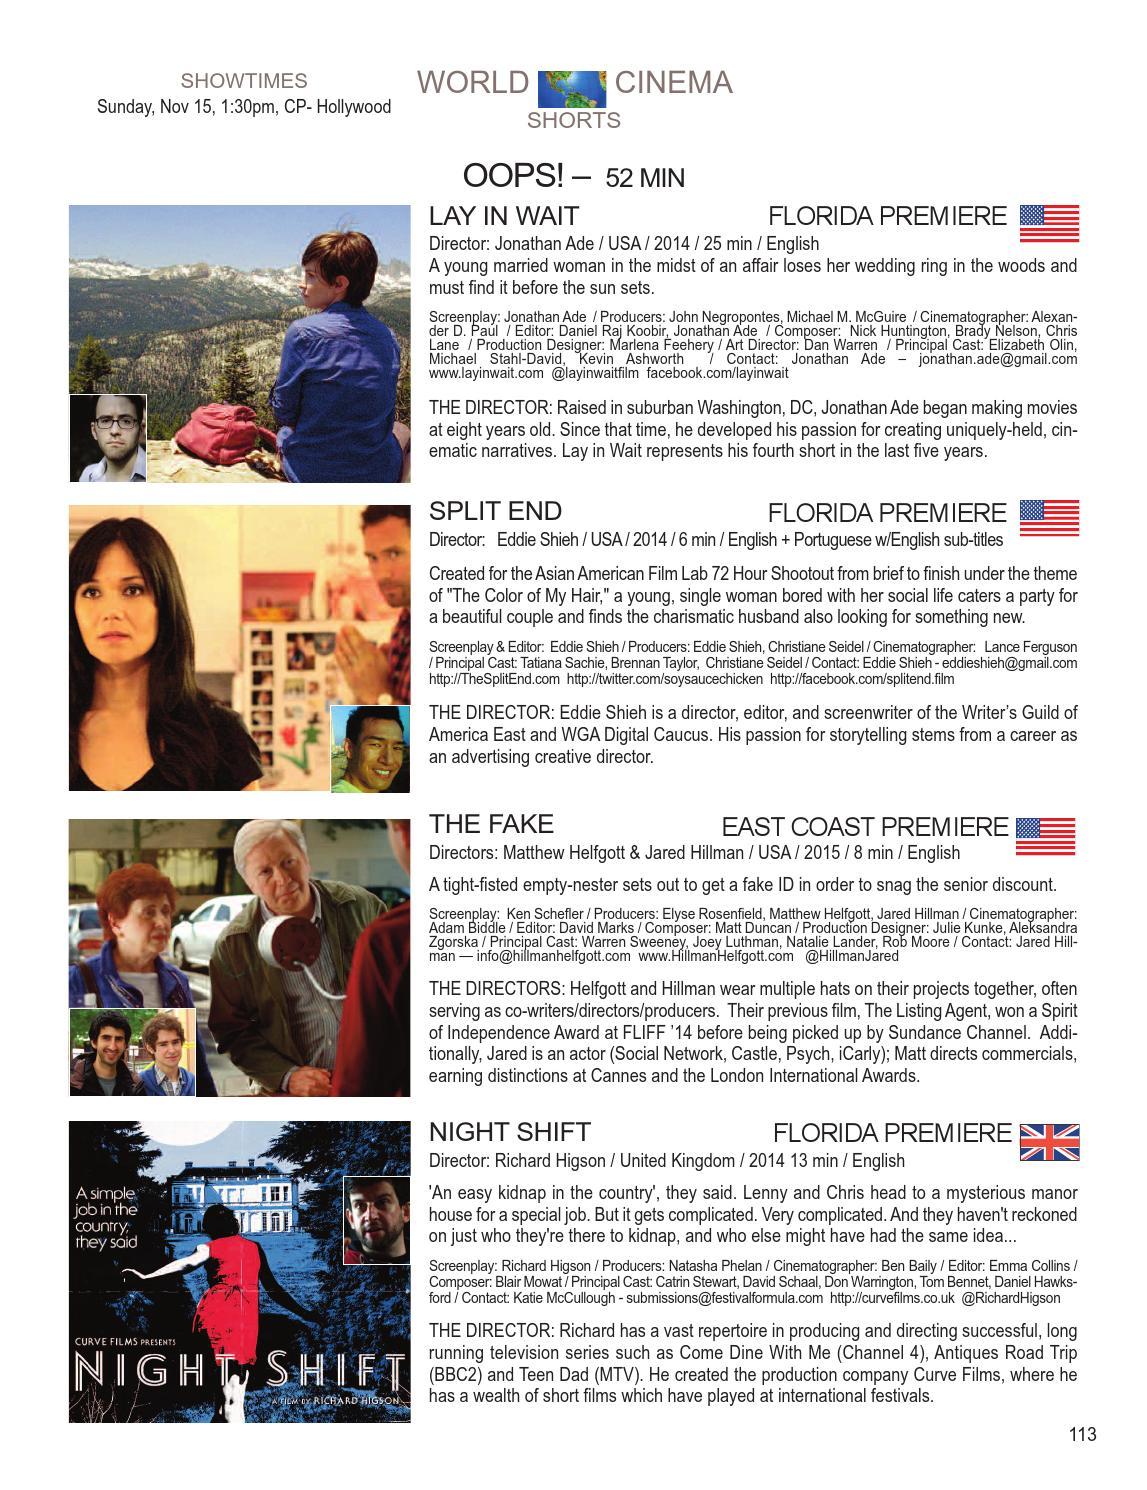 2015 Fort Lauderdale International Film Festival 30th